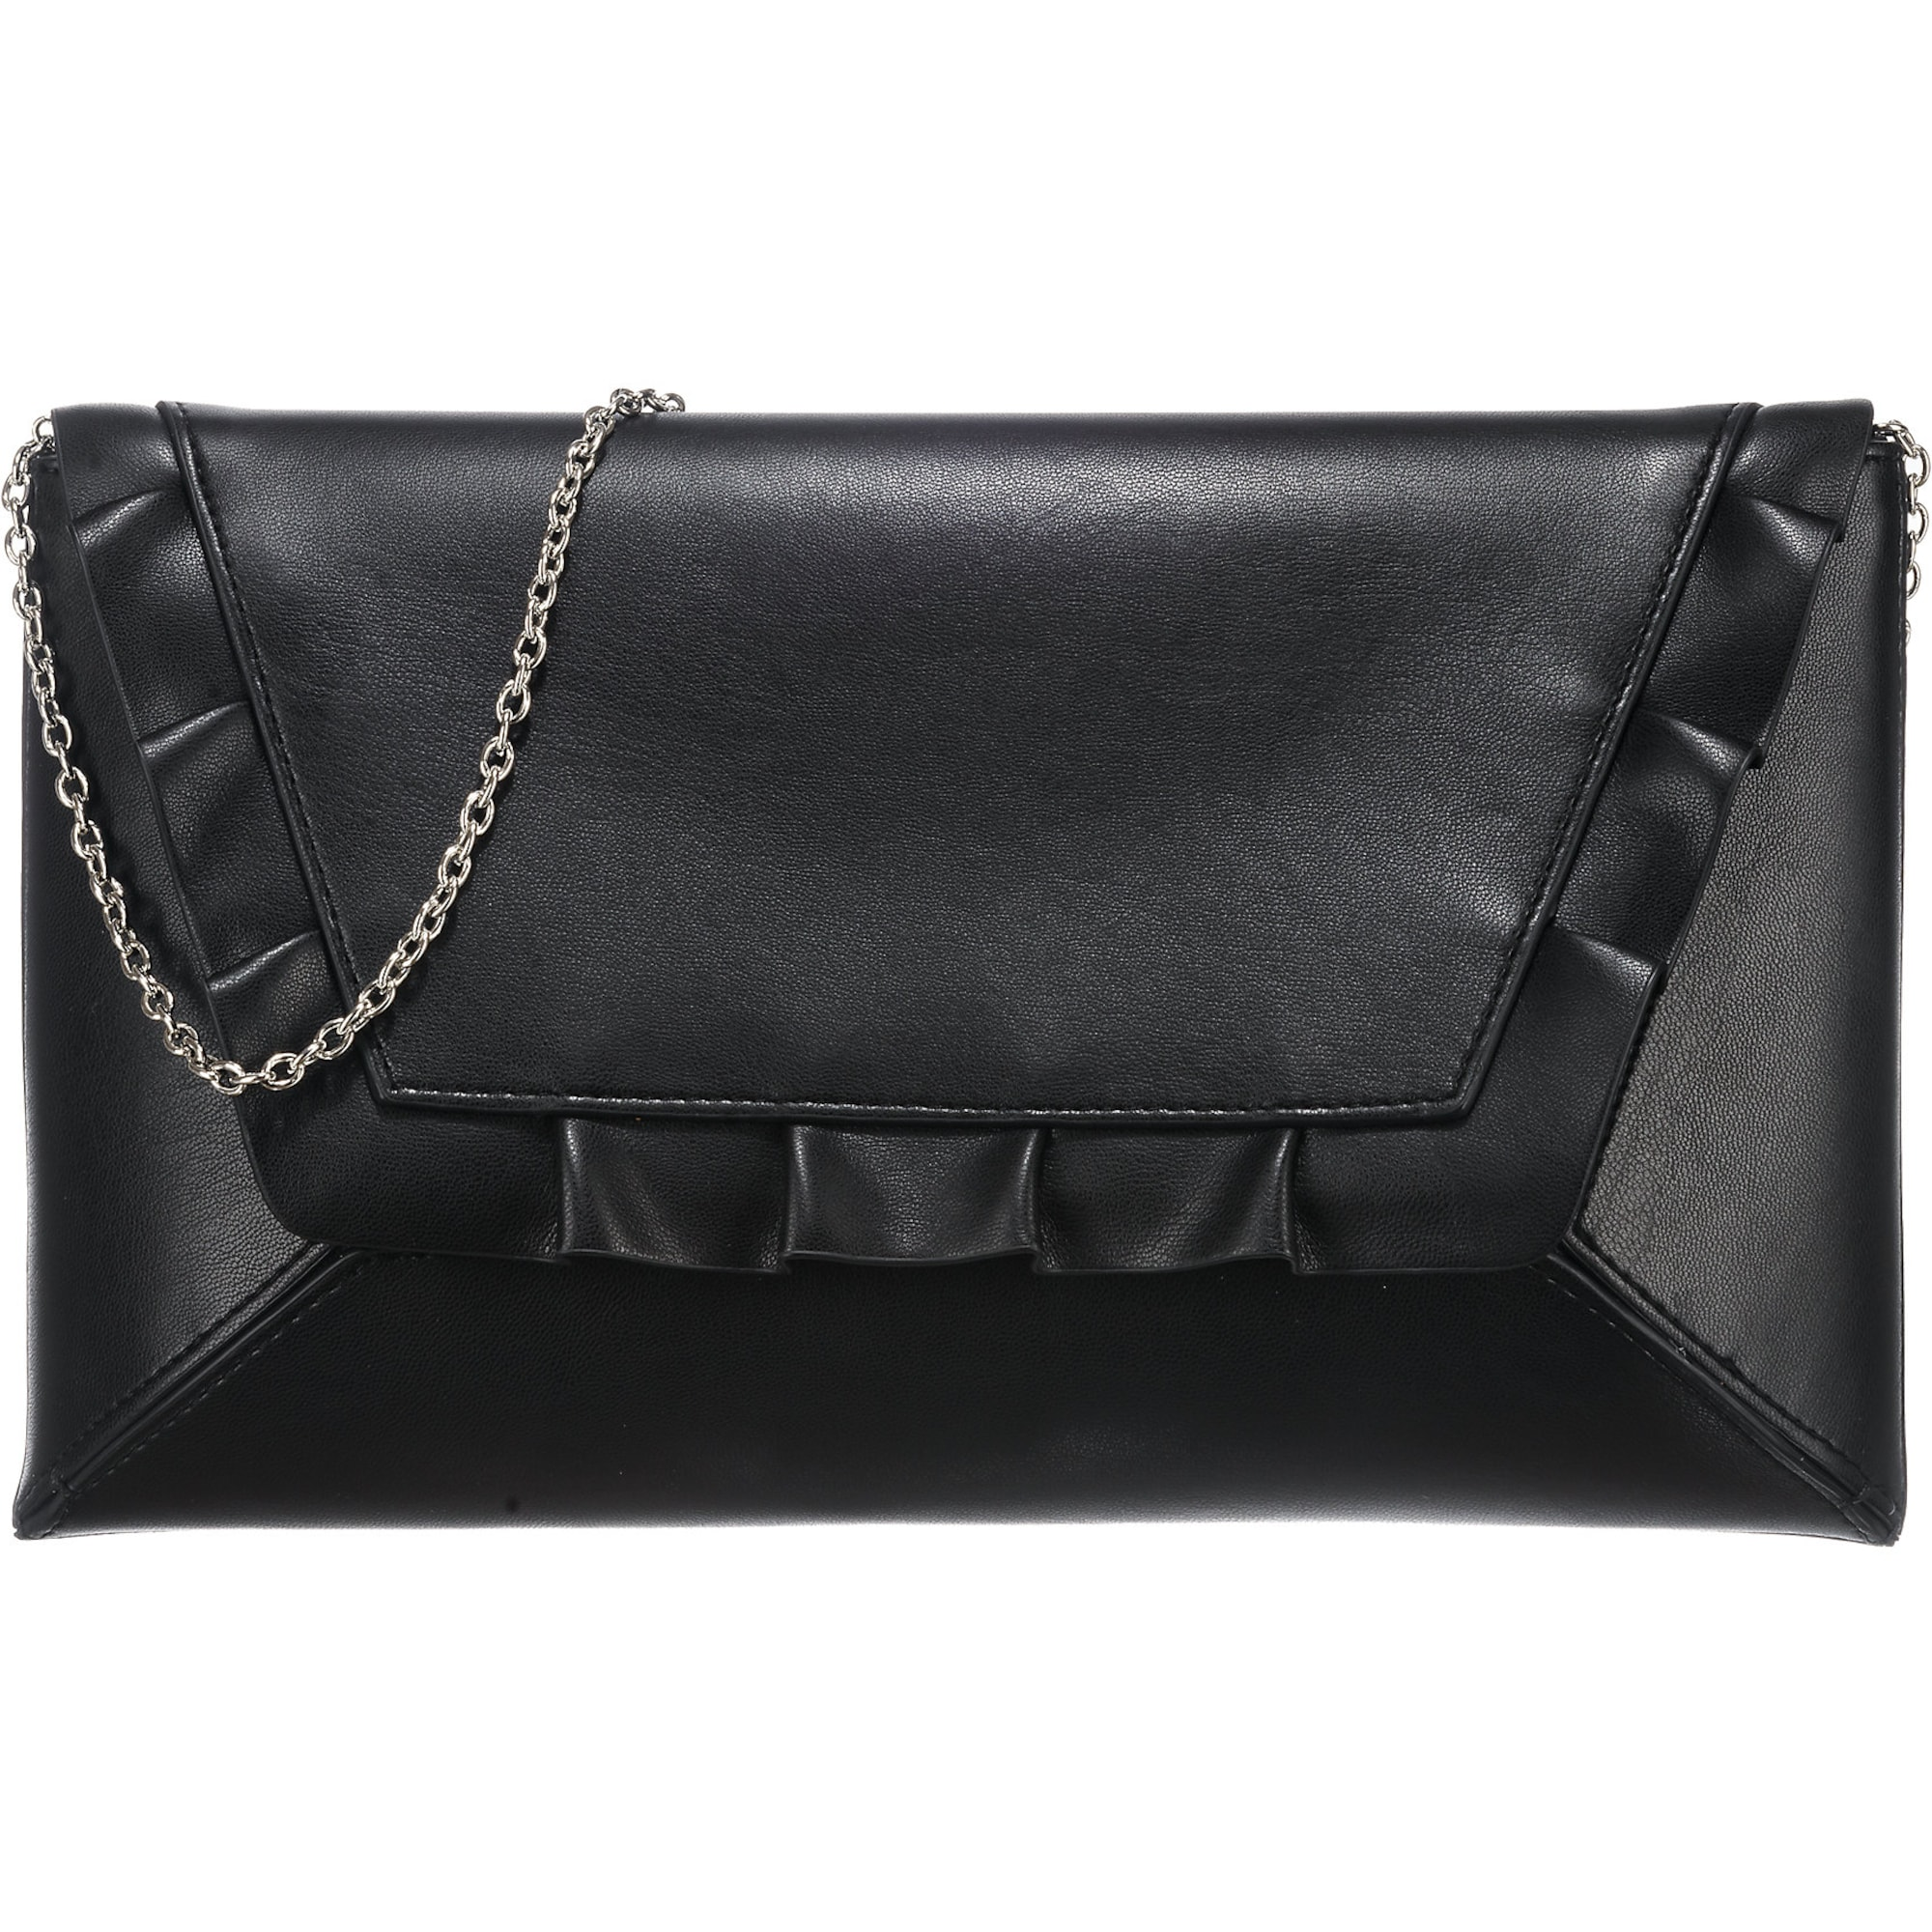 Abendtasche   Taschen > Handtaschen > Abendtaschen   Schwarz   Buffalo